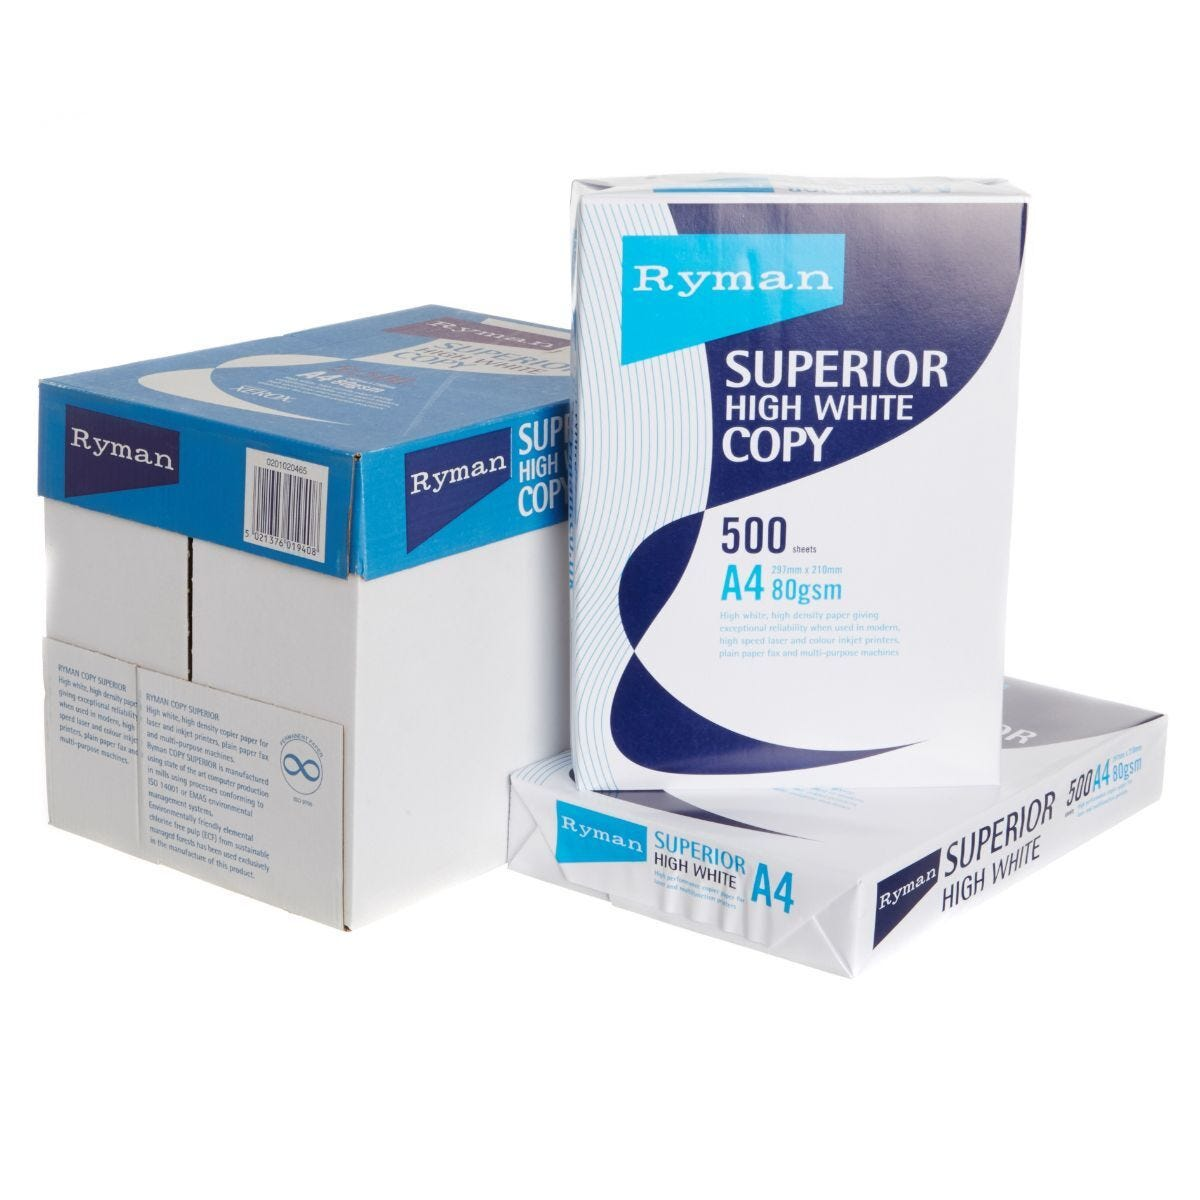 Ryman Superior Copy Paper A4 80gsm 500 Sheets Box of 5